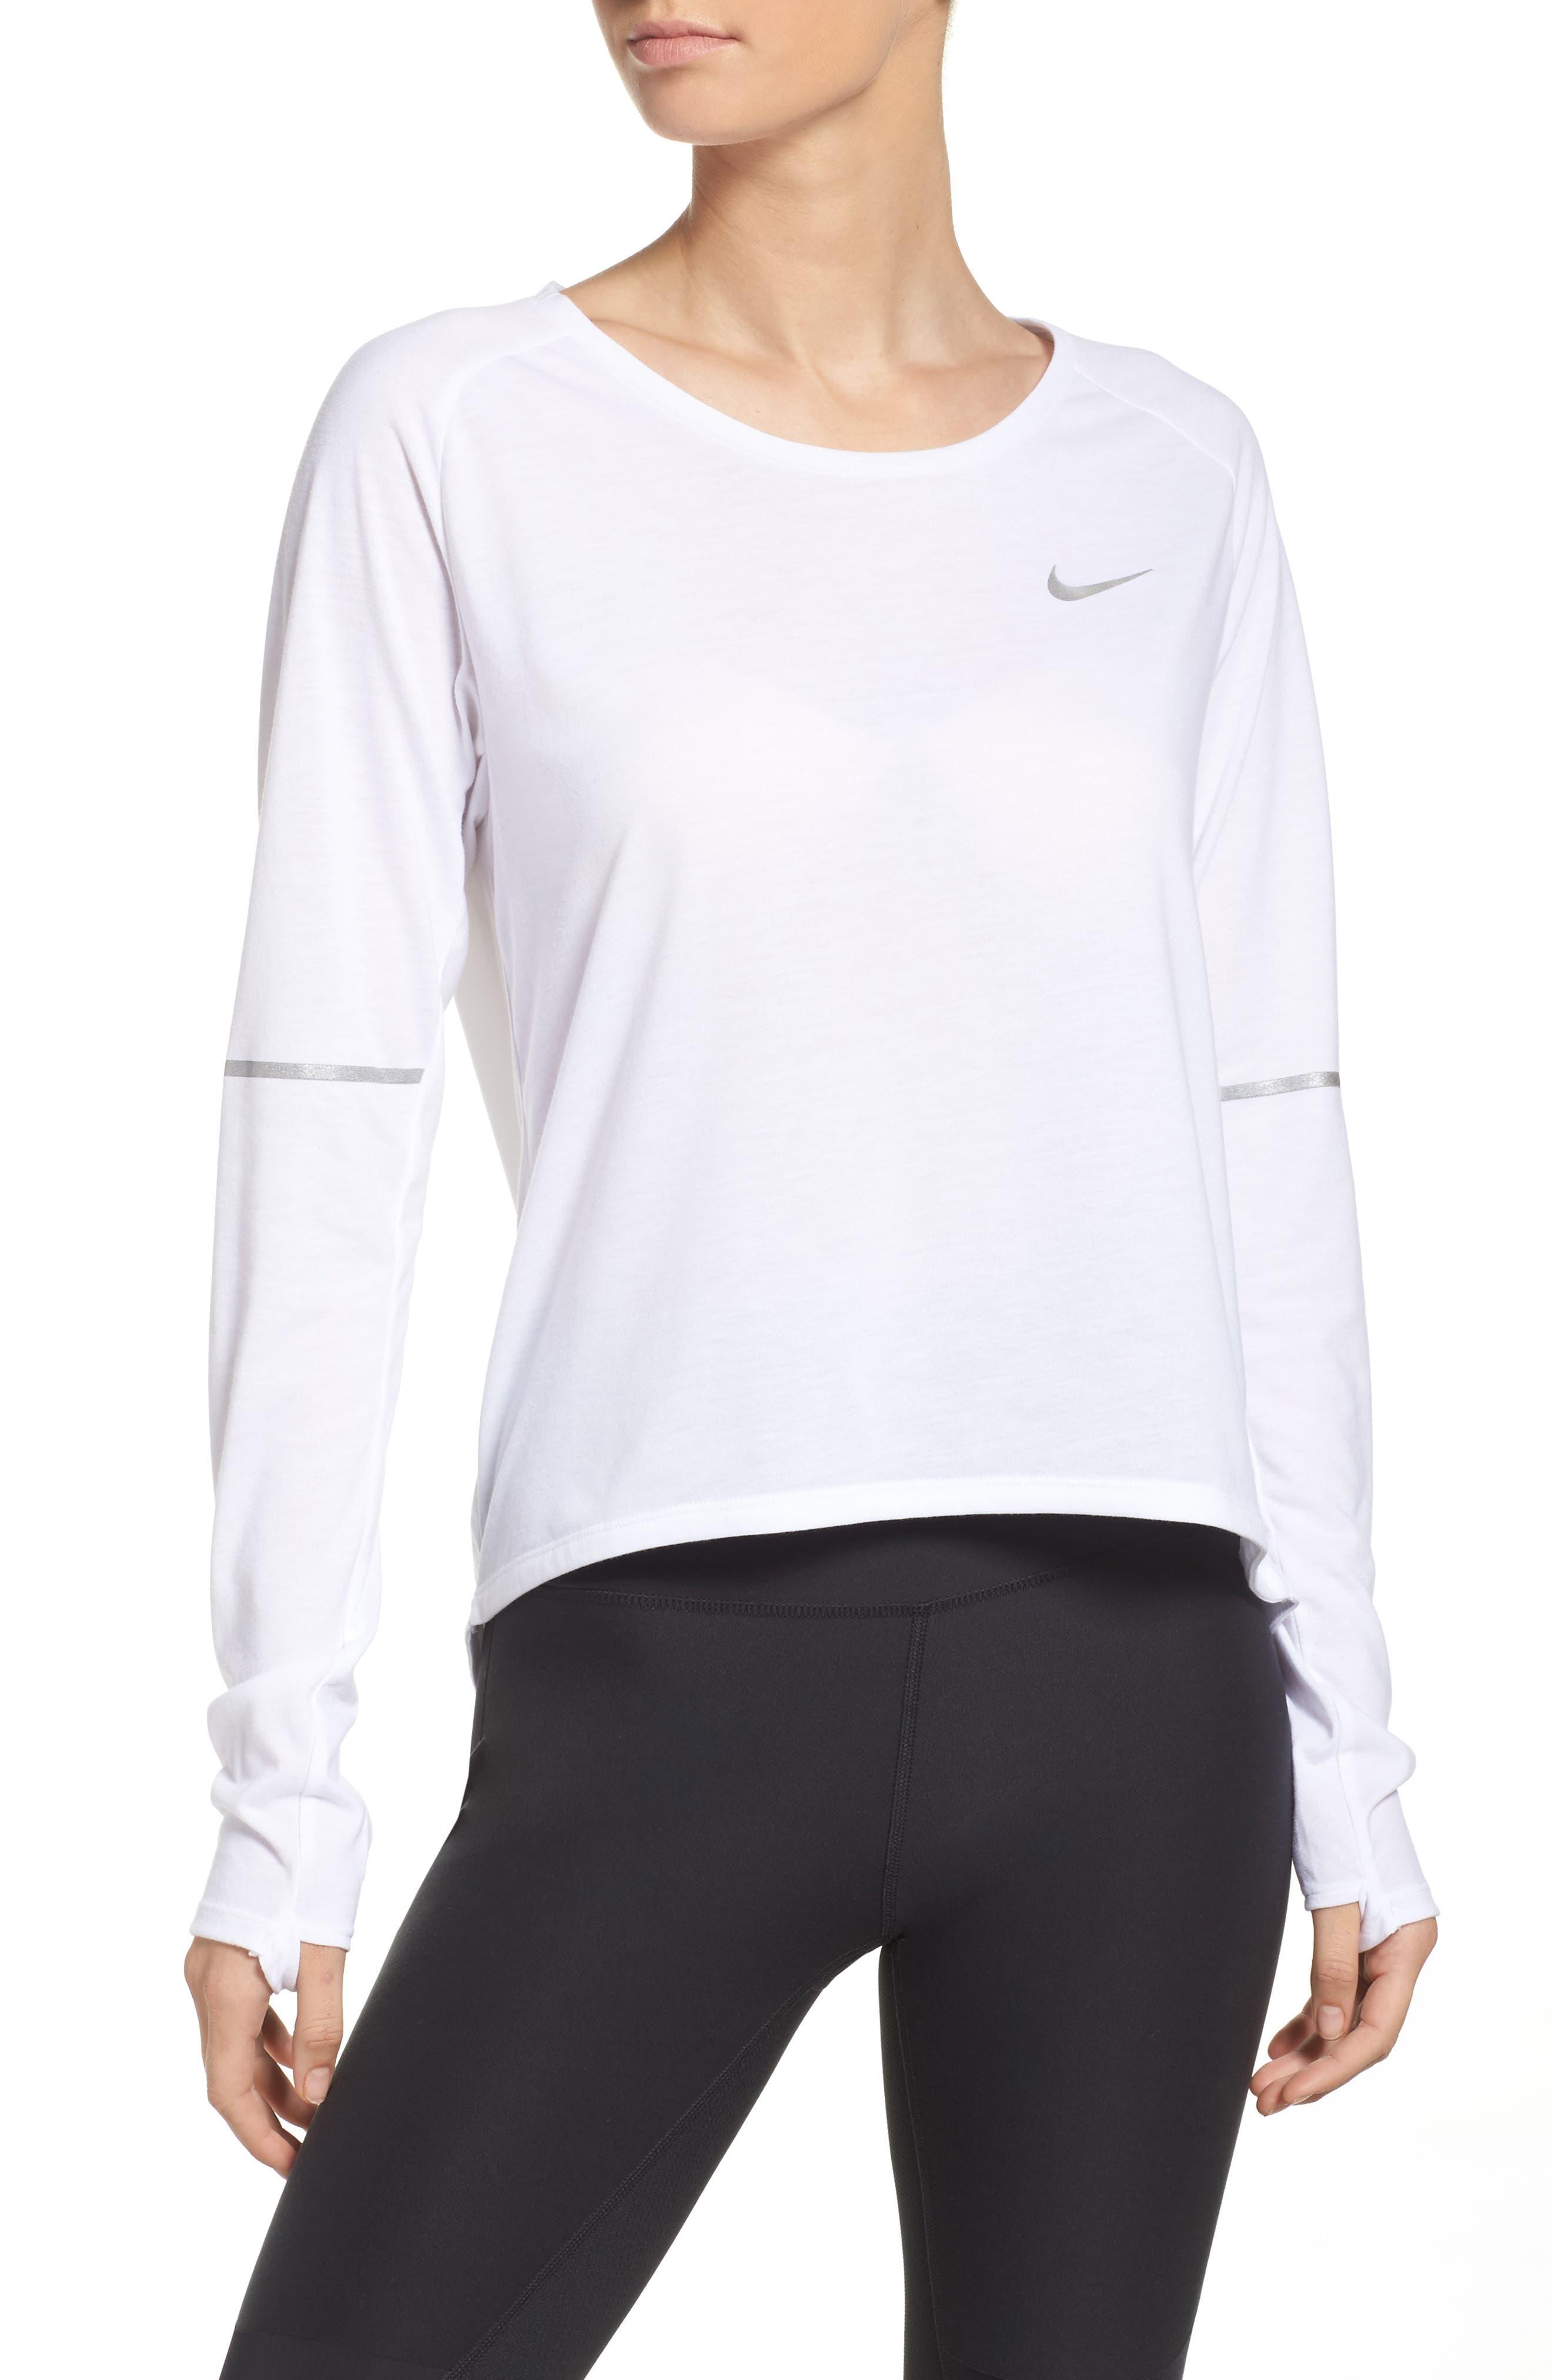 Nike Breathe Running Top